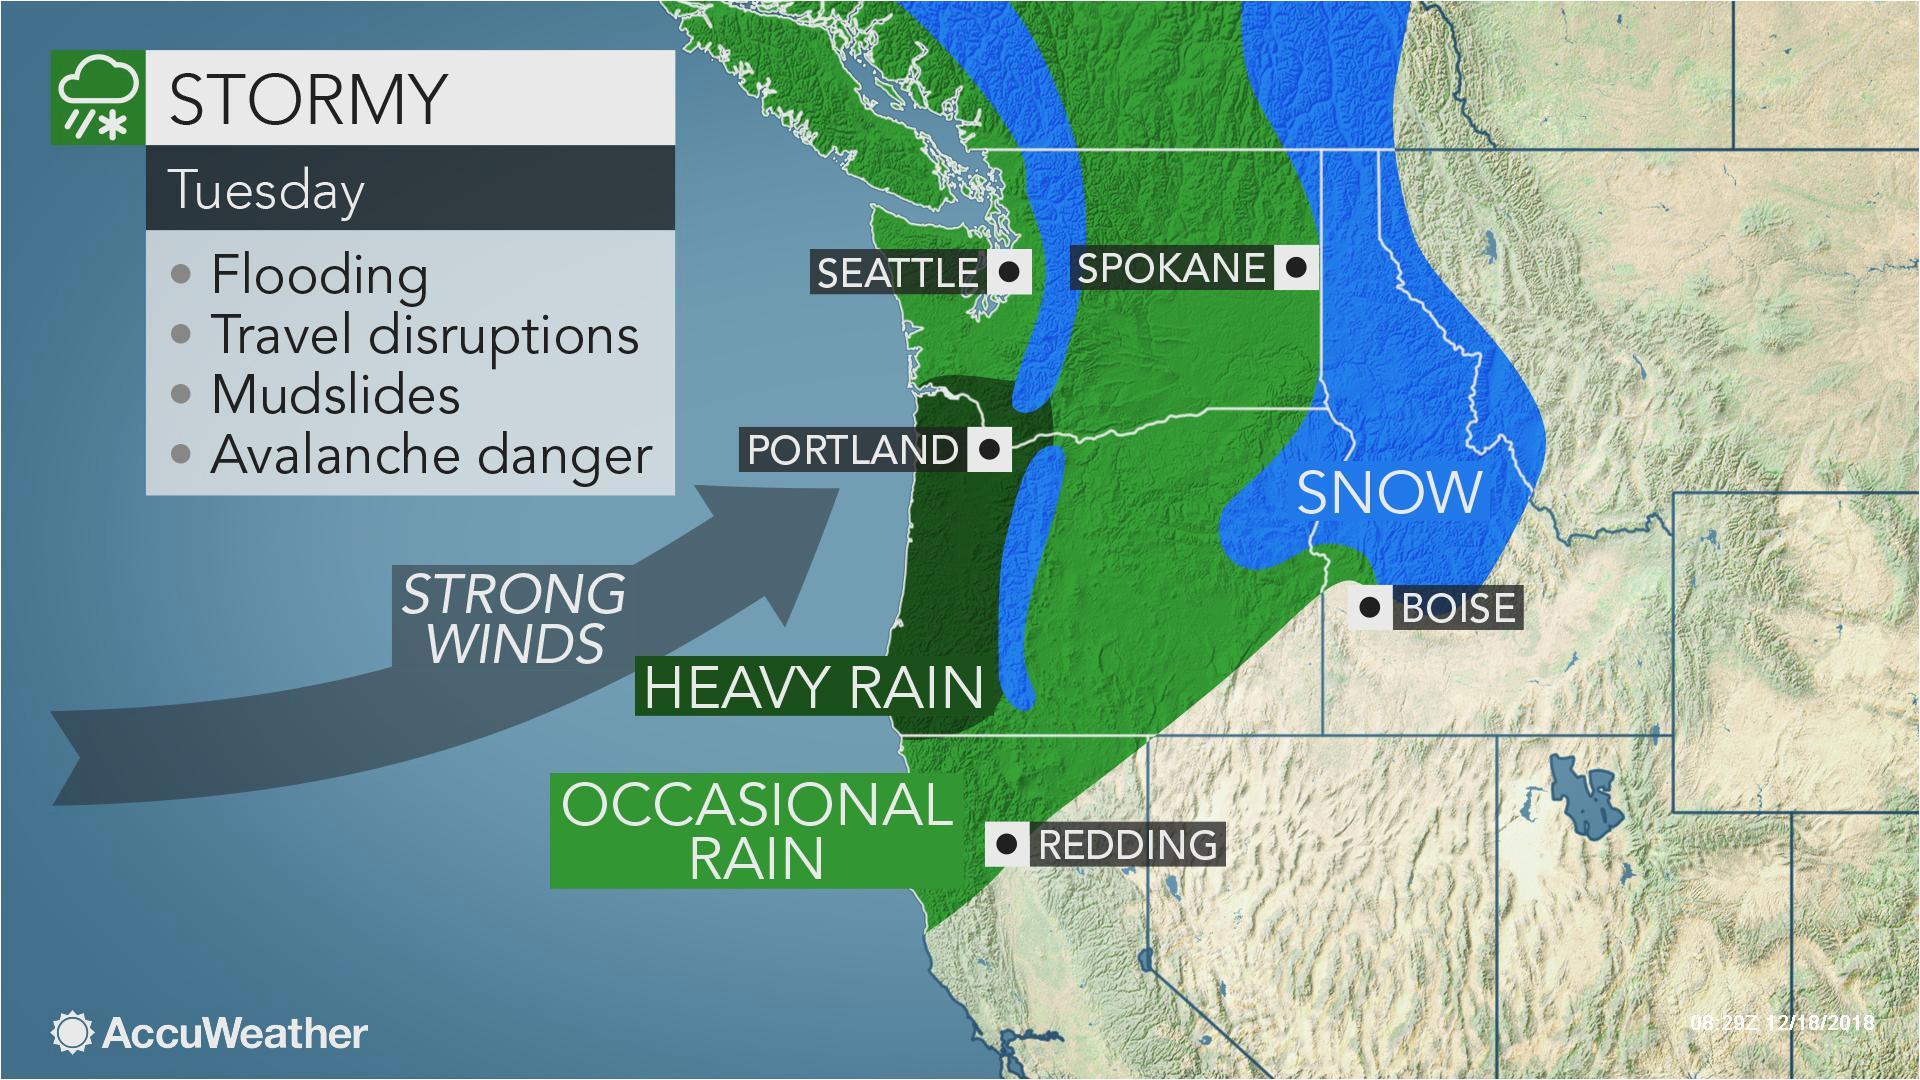 early week storm may be strongest yet this season in northwestern us